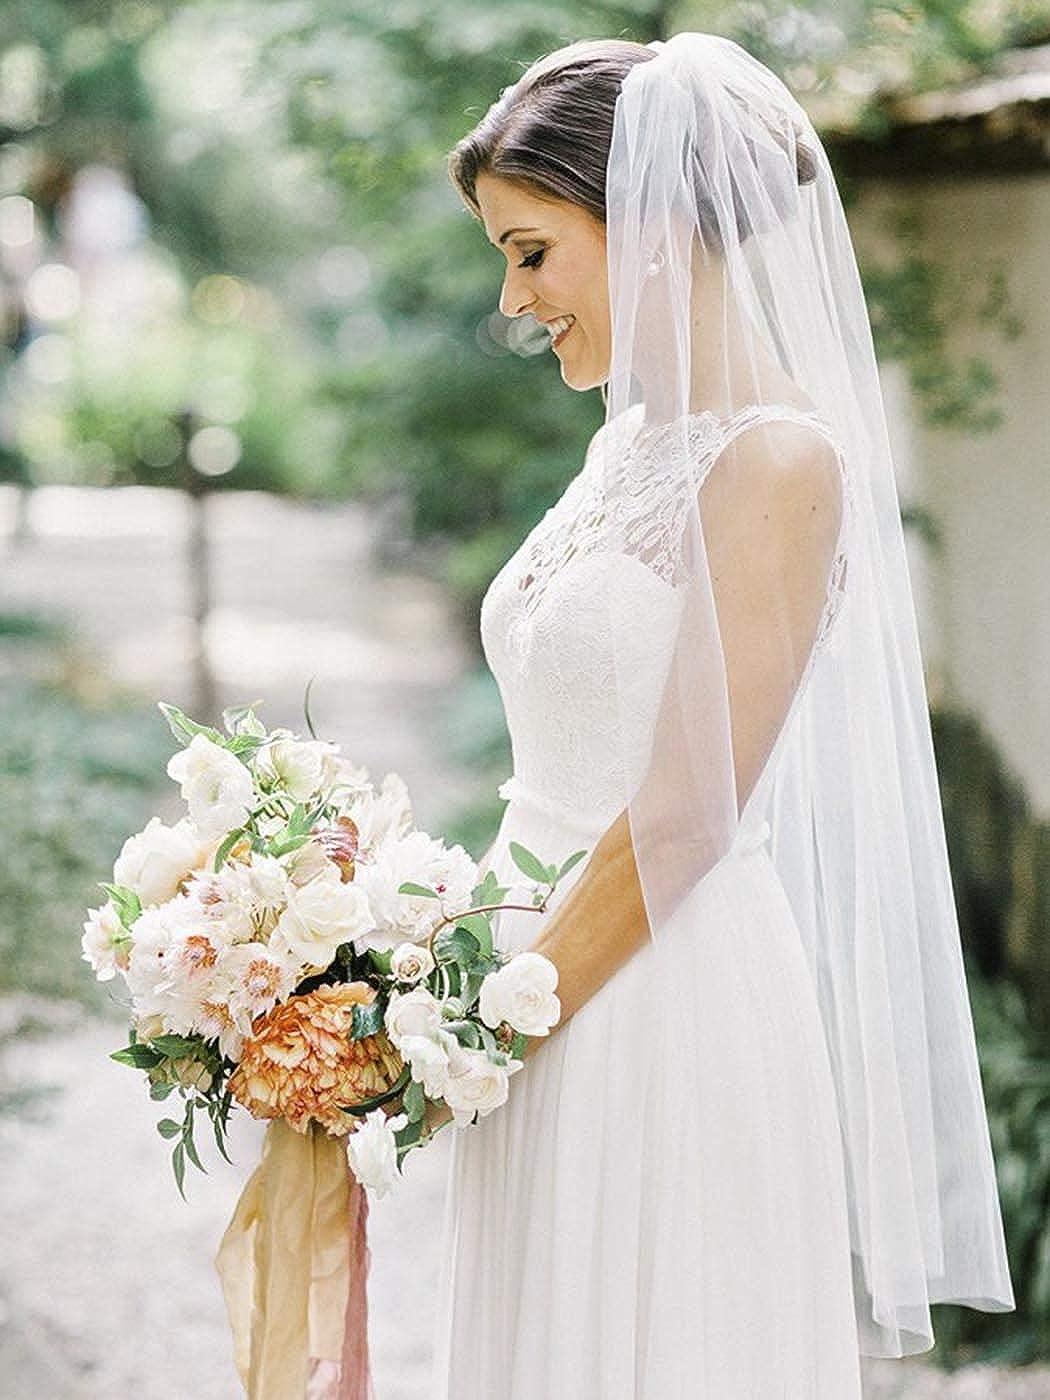 Edary Wedding Bridal Veil with Comb White Cut Edge Veils Drop Veil Wedding Elbow Length Veil 1 Tier Tulle Bridal Hair Accessories for Bride and Bridesmaids